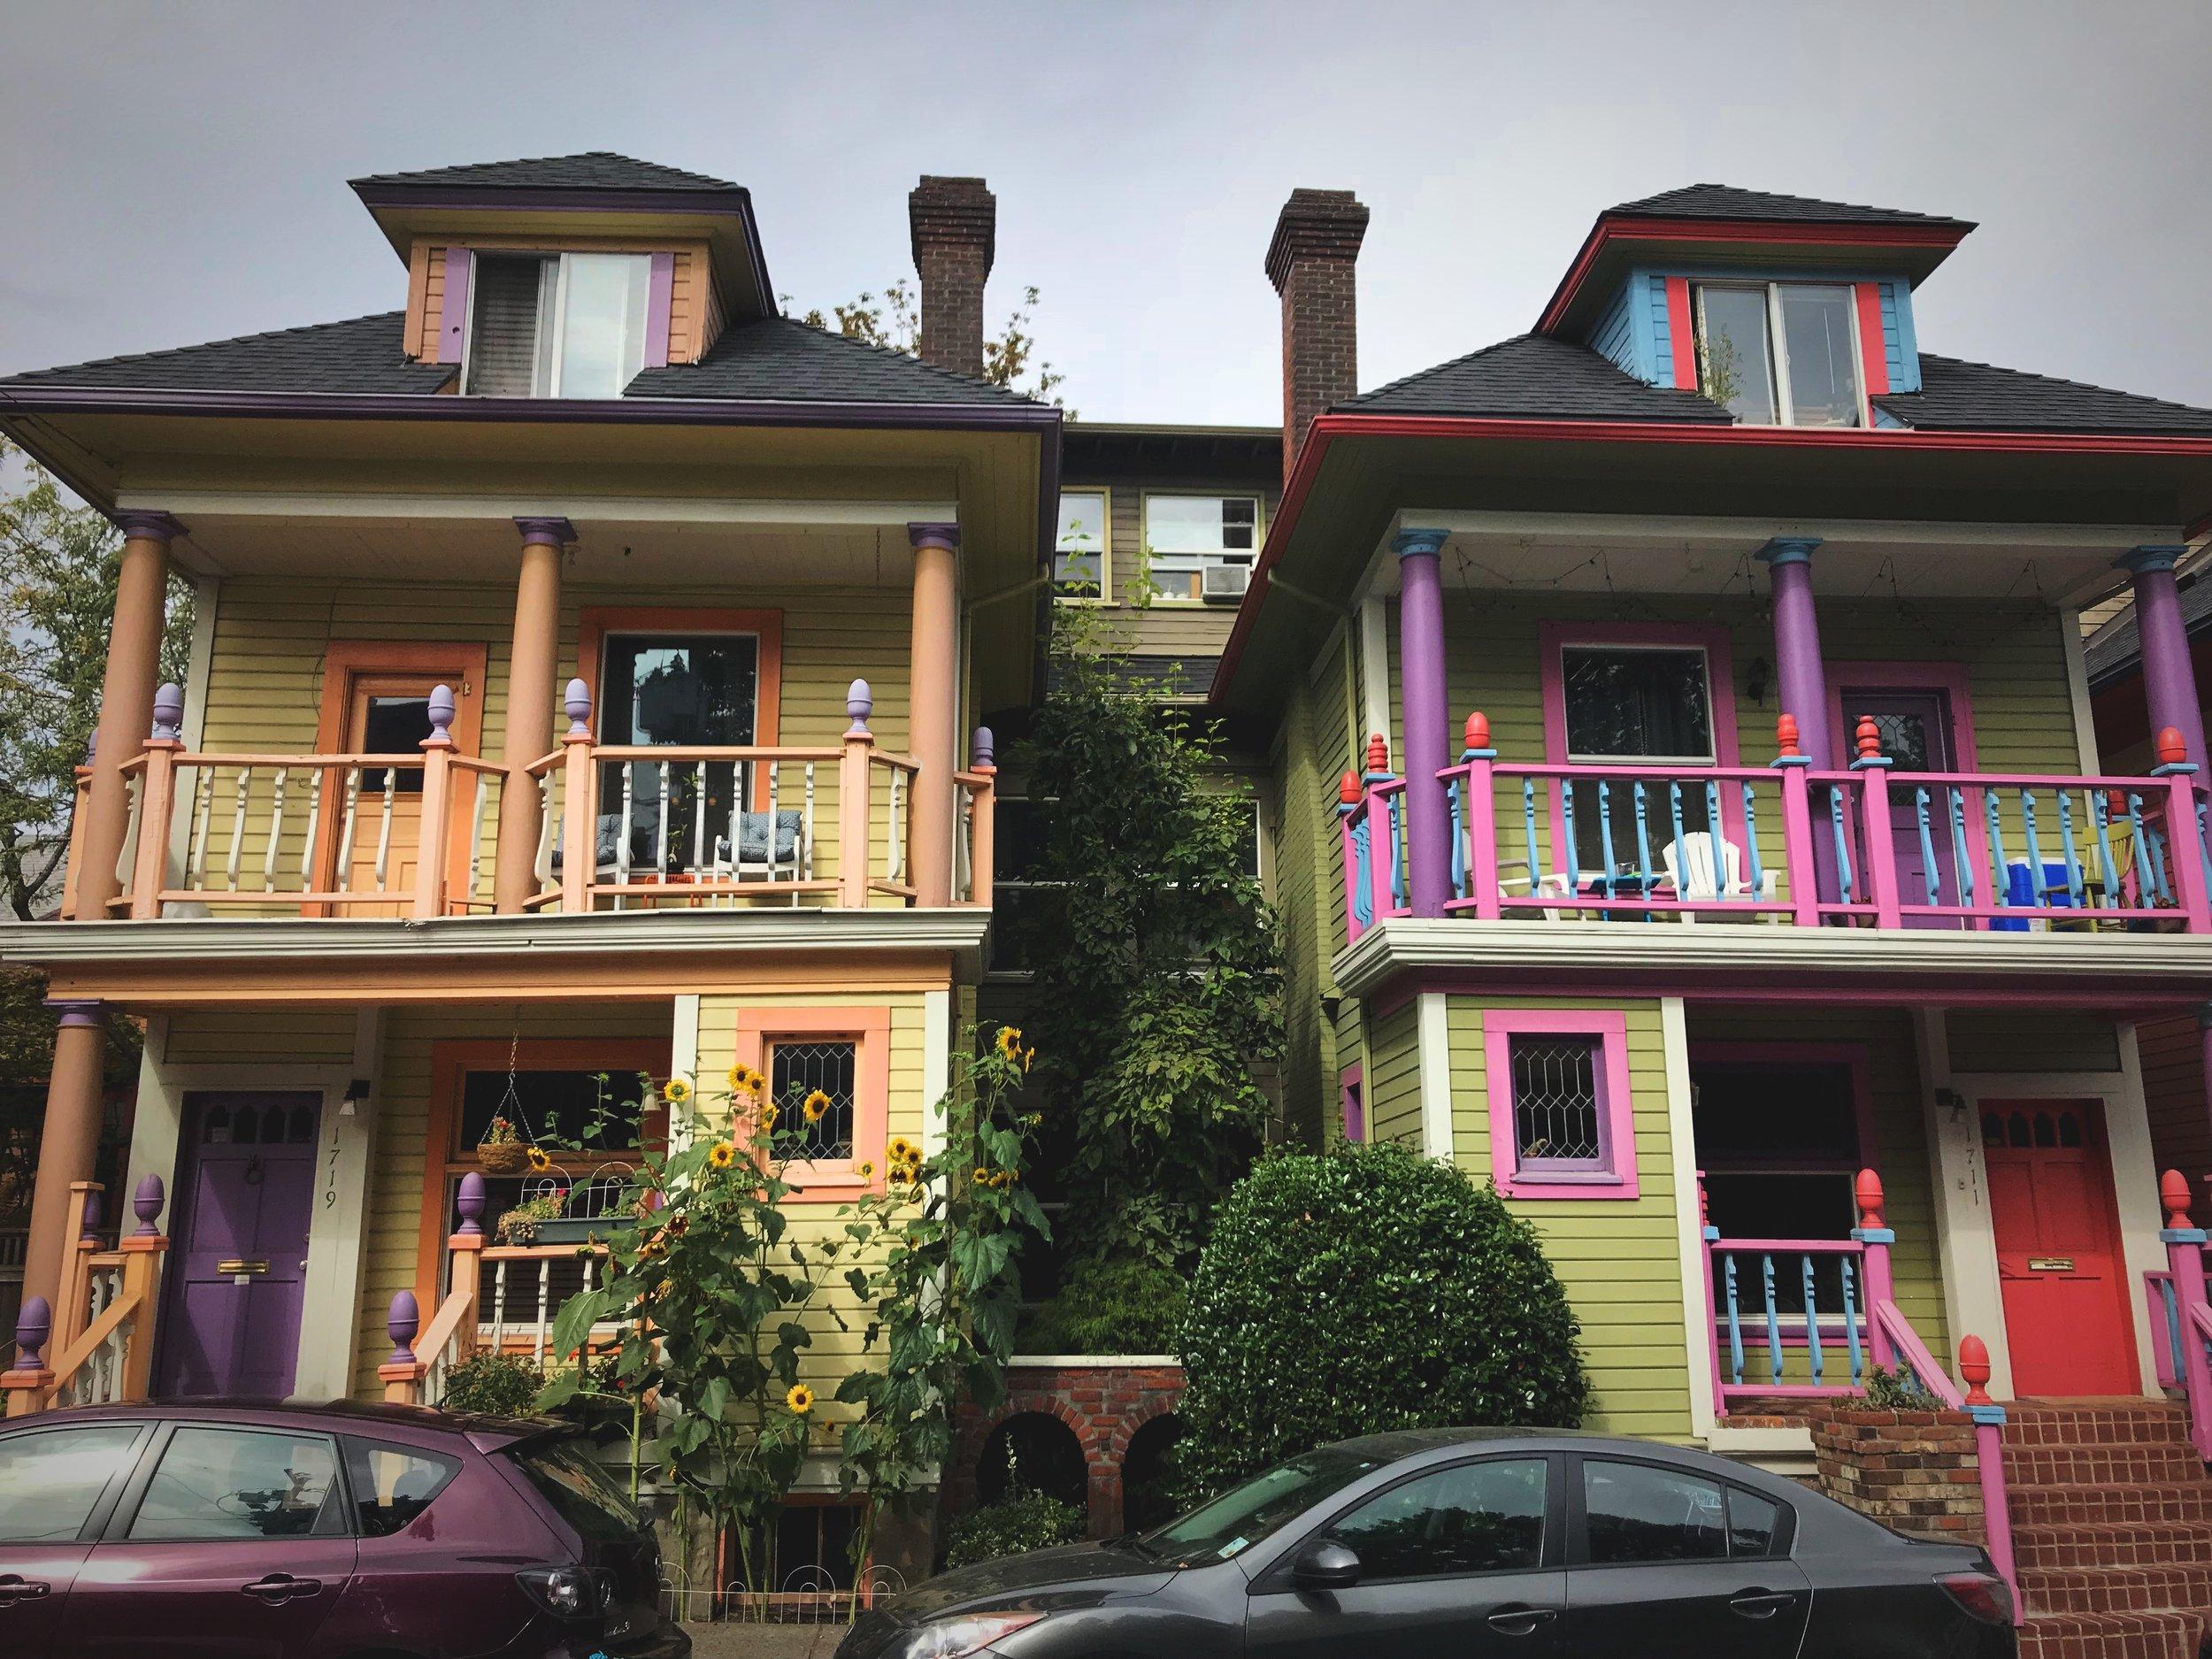 Colorful houses in a funky neighborhood near Portland's International Rose Test Garden.